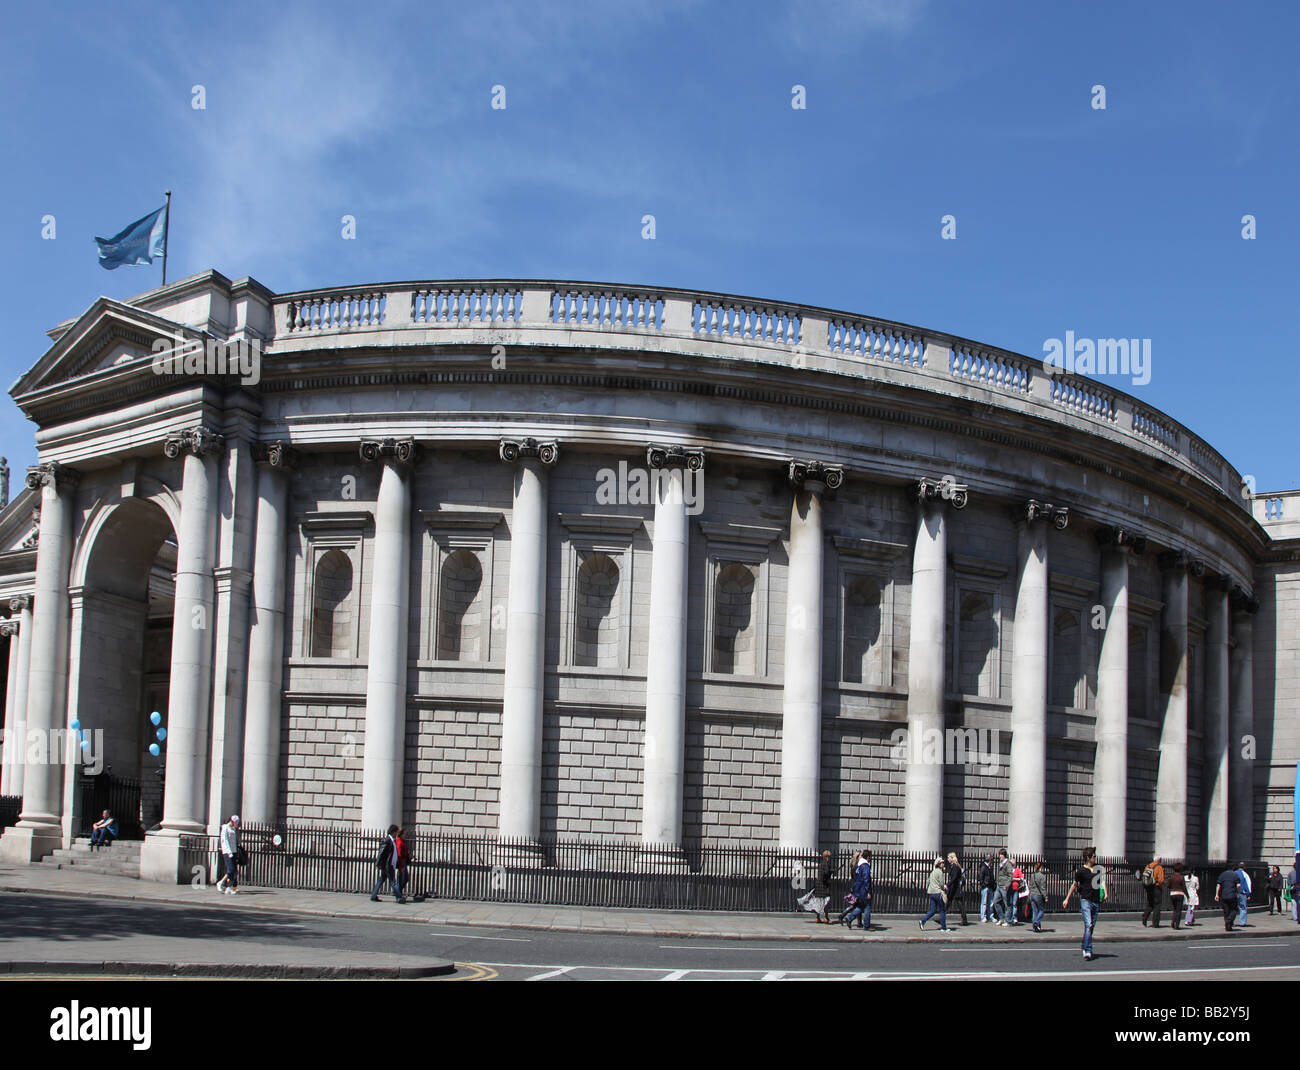 Bank of Ireland Dublin - Stock Image